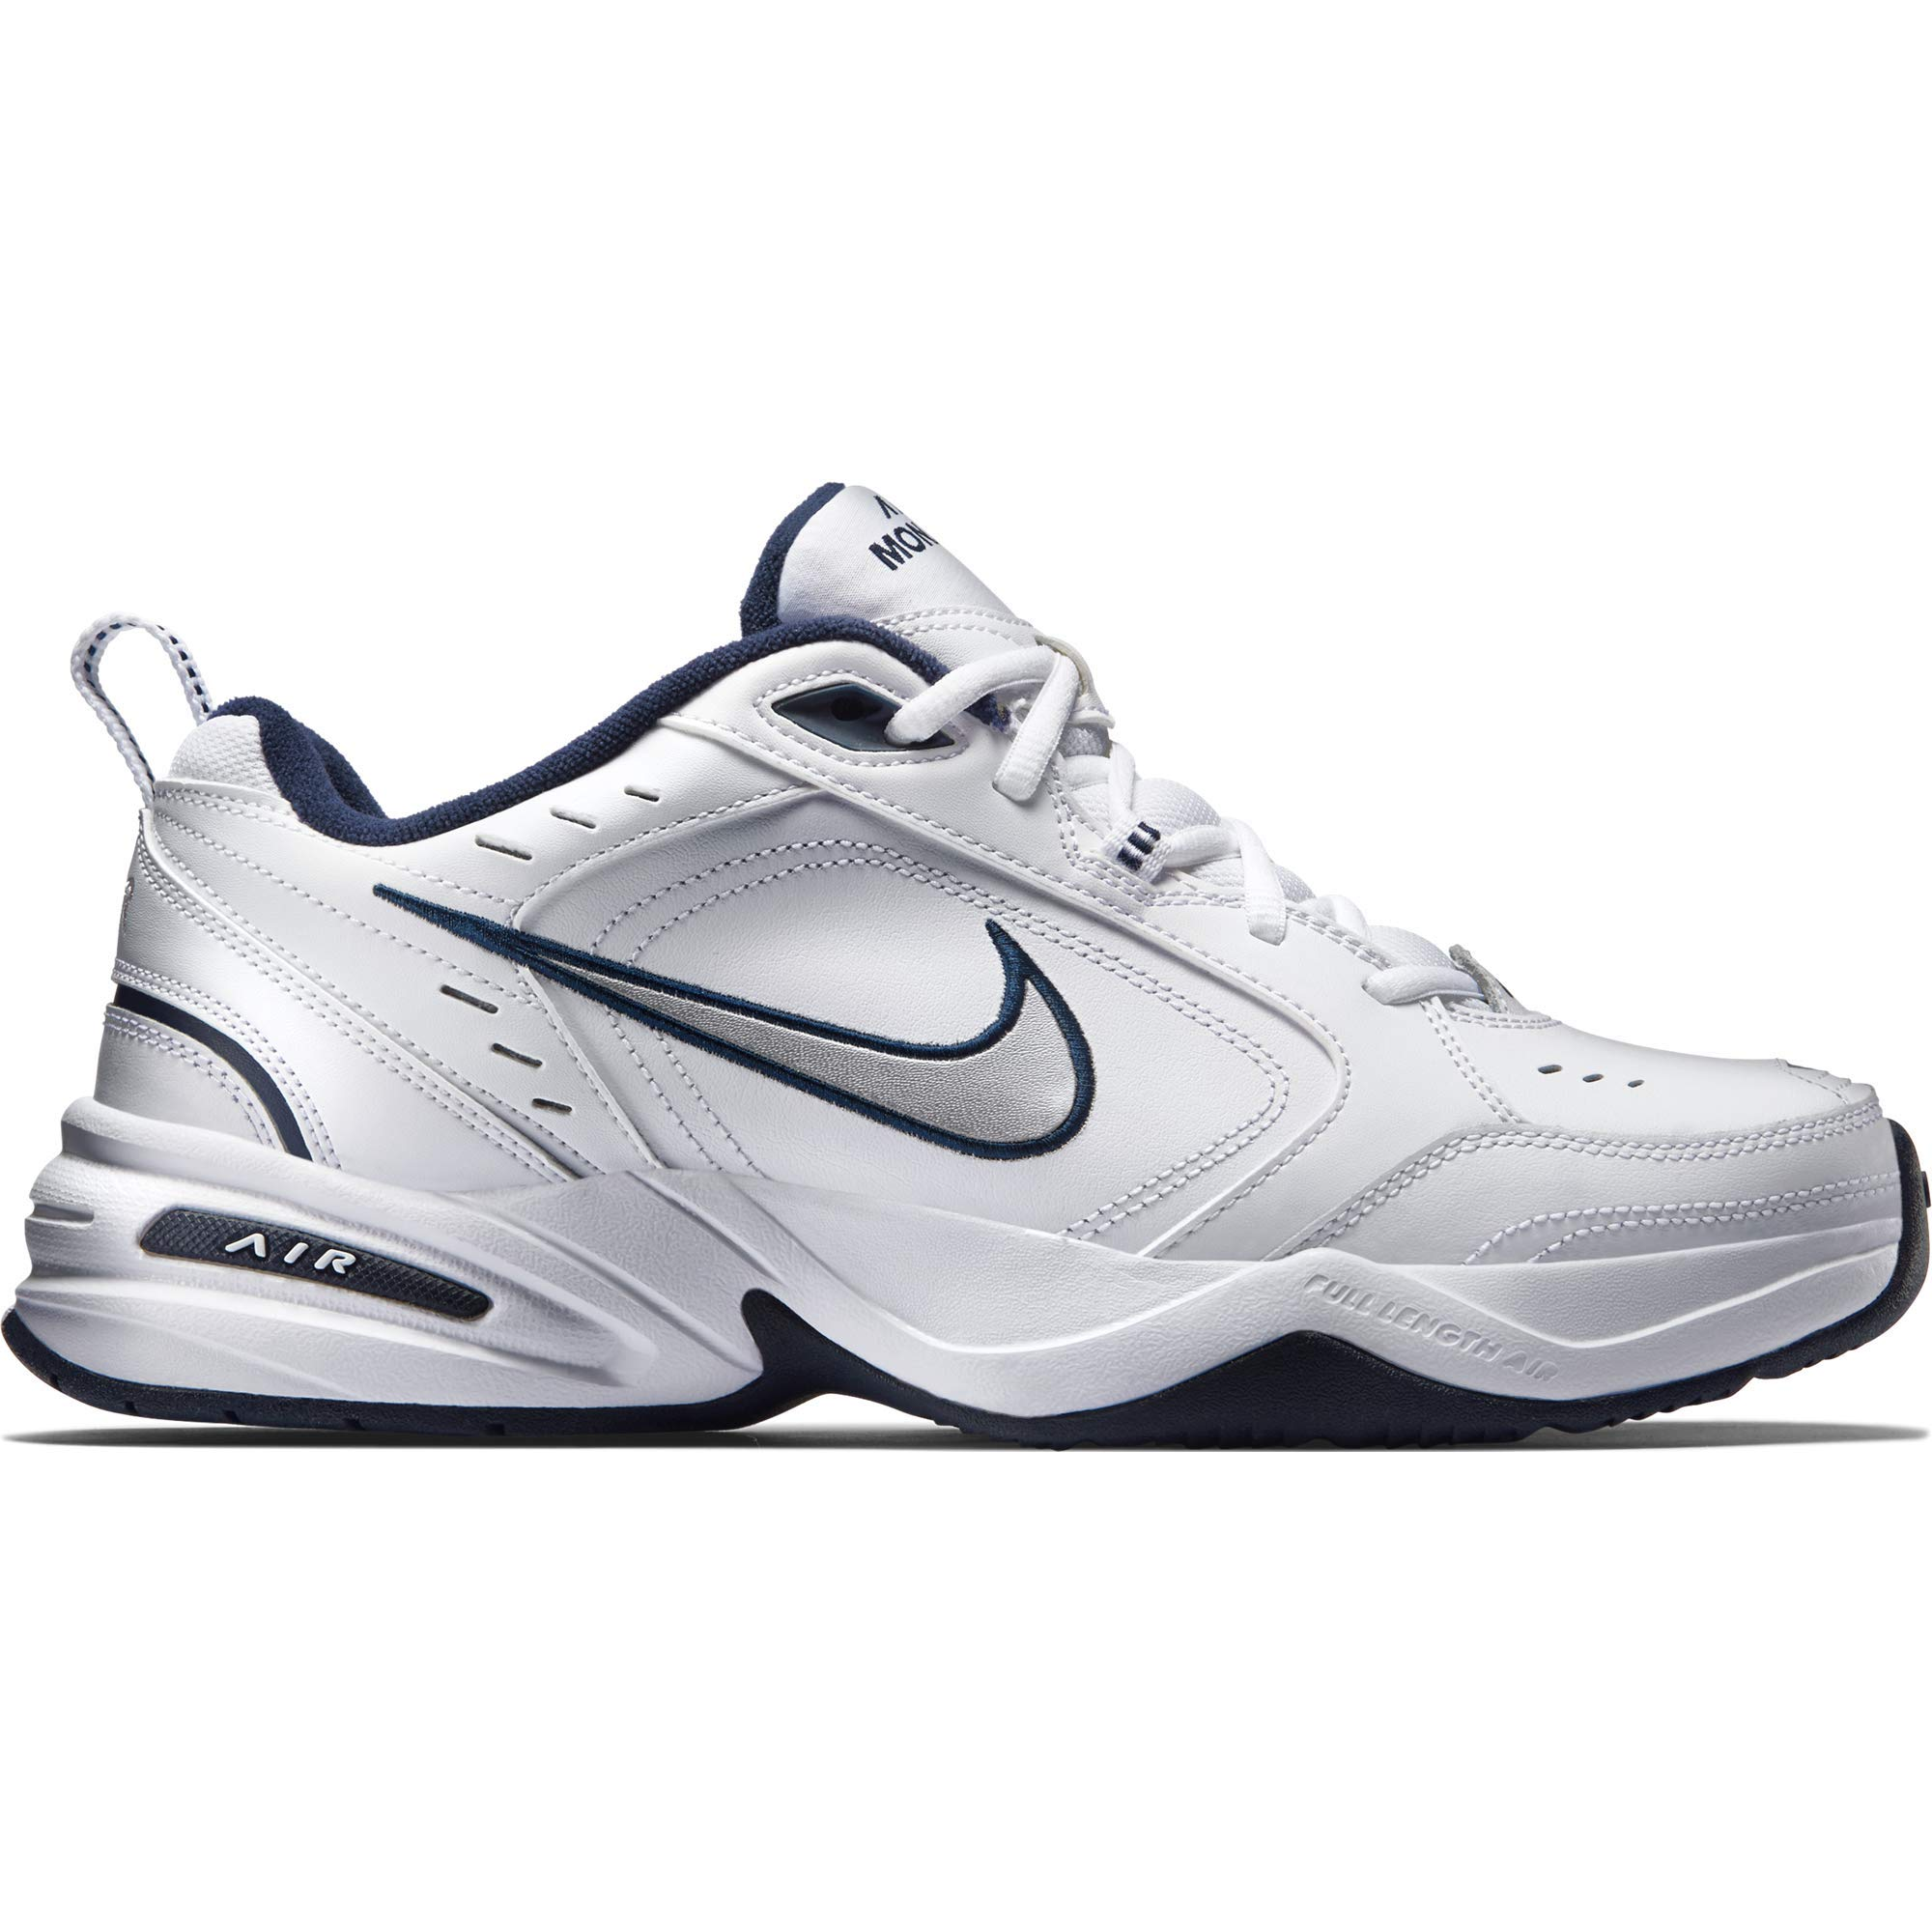 NIKE AIR MONARCH IV (MENS) - 6.5 White/Metallic Silver by Nike (Image #8)